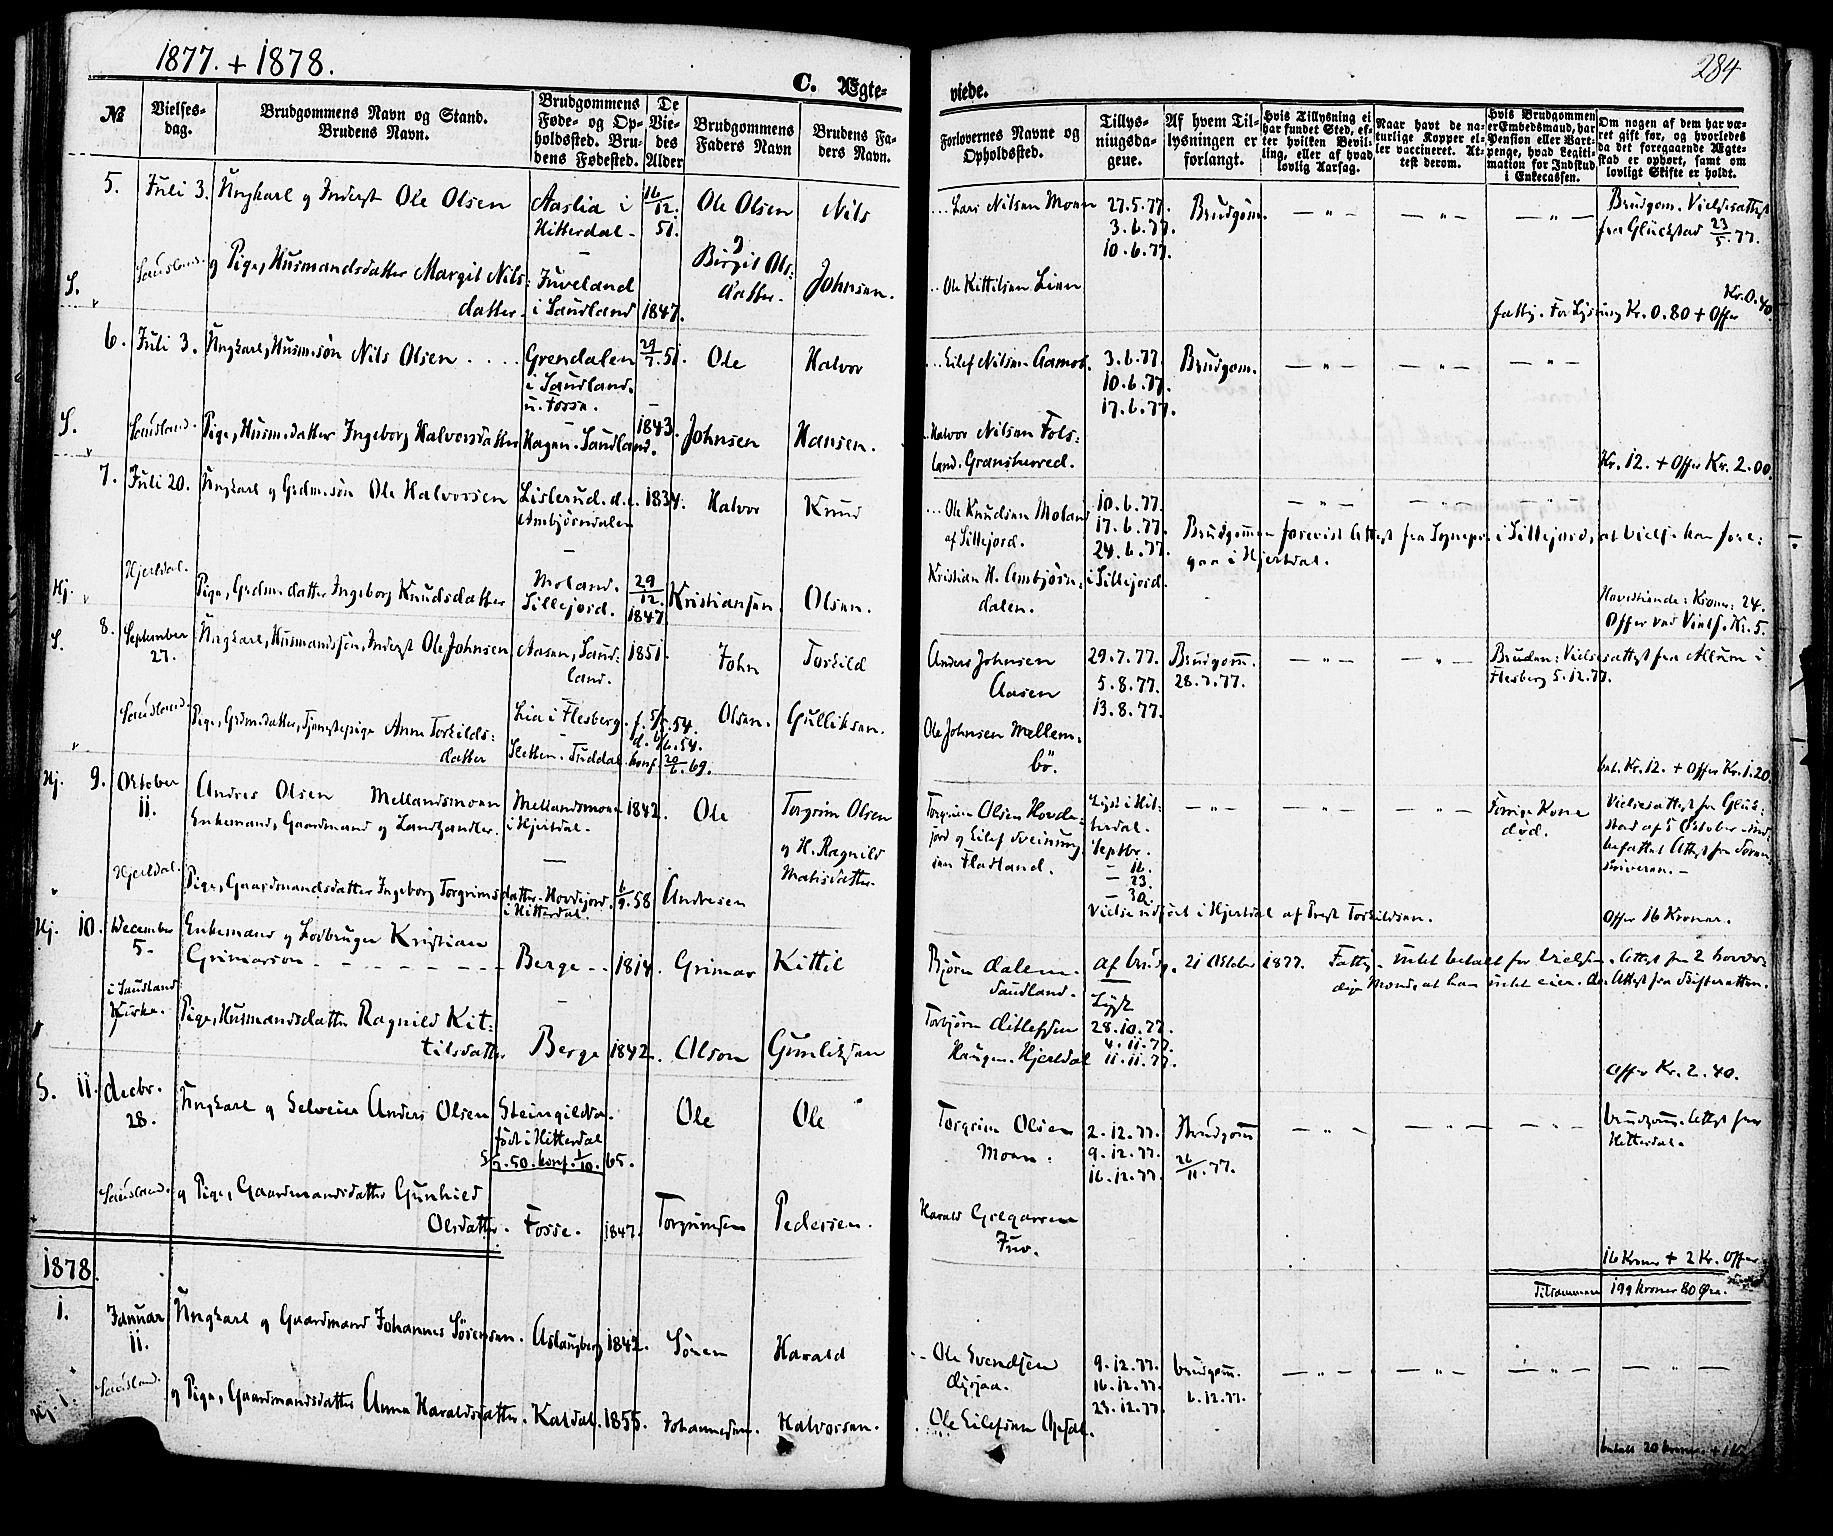 SAKO, Hjartdal kirkebøker, F/Fa/L0009: Ministerialbok nr. I 9, 1860-1879, s. 284